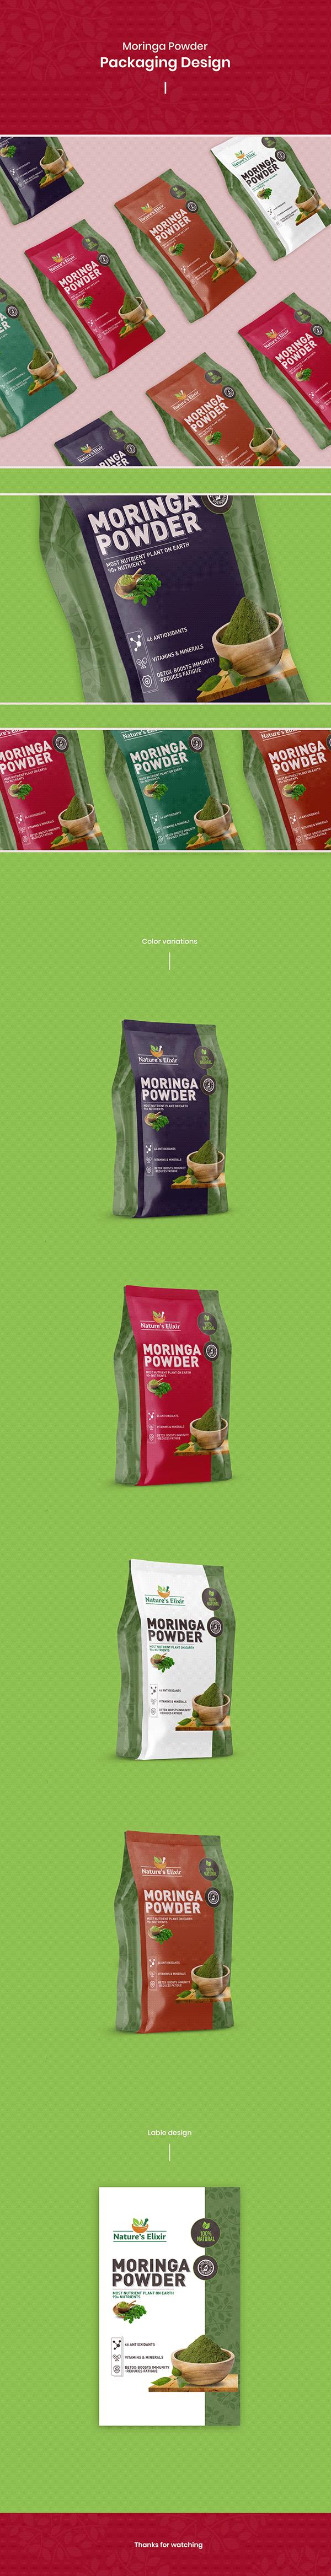 Moringa - Packaging Design